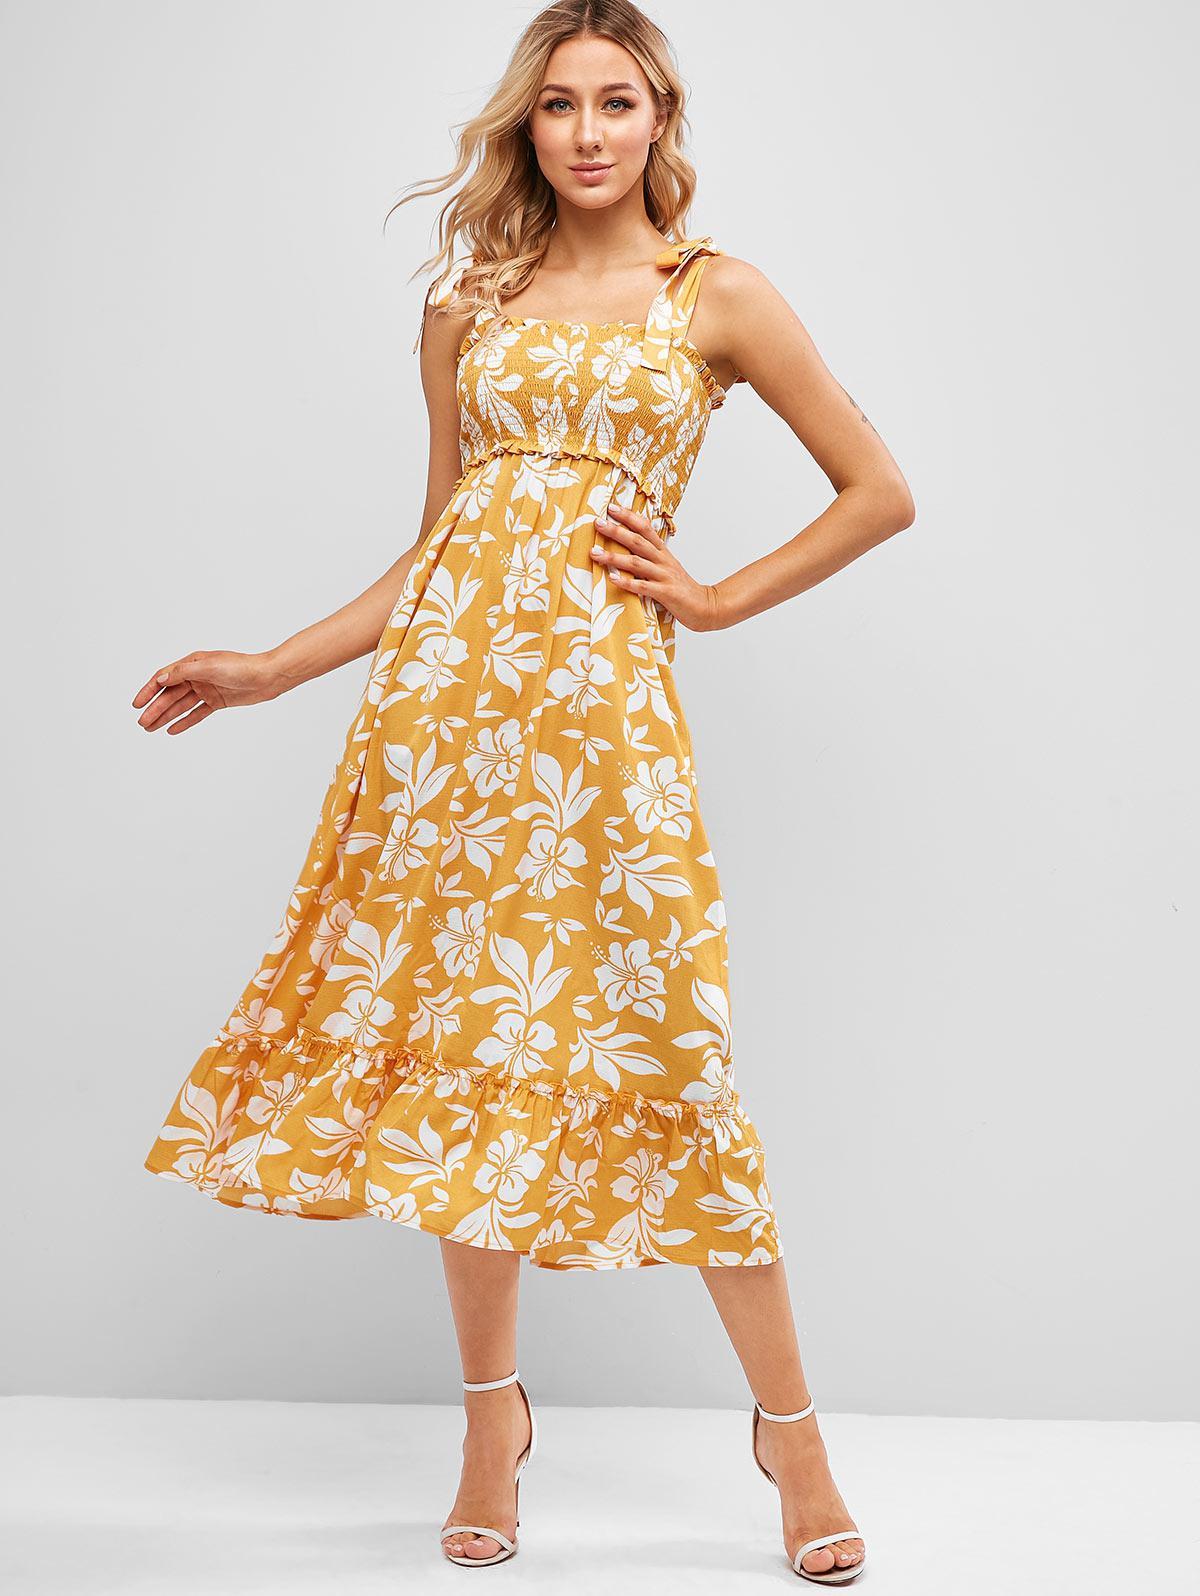 ZAFUL Tie Strap Flower Print Flounce Smocked Dress